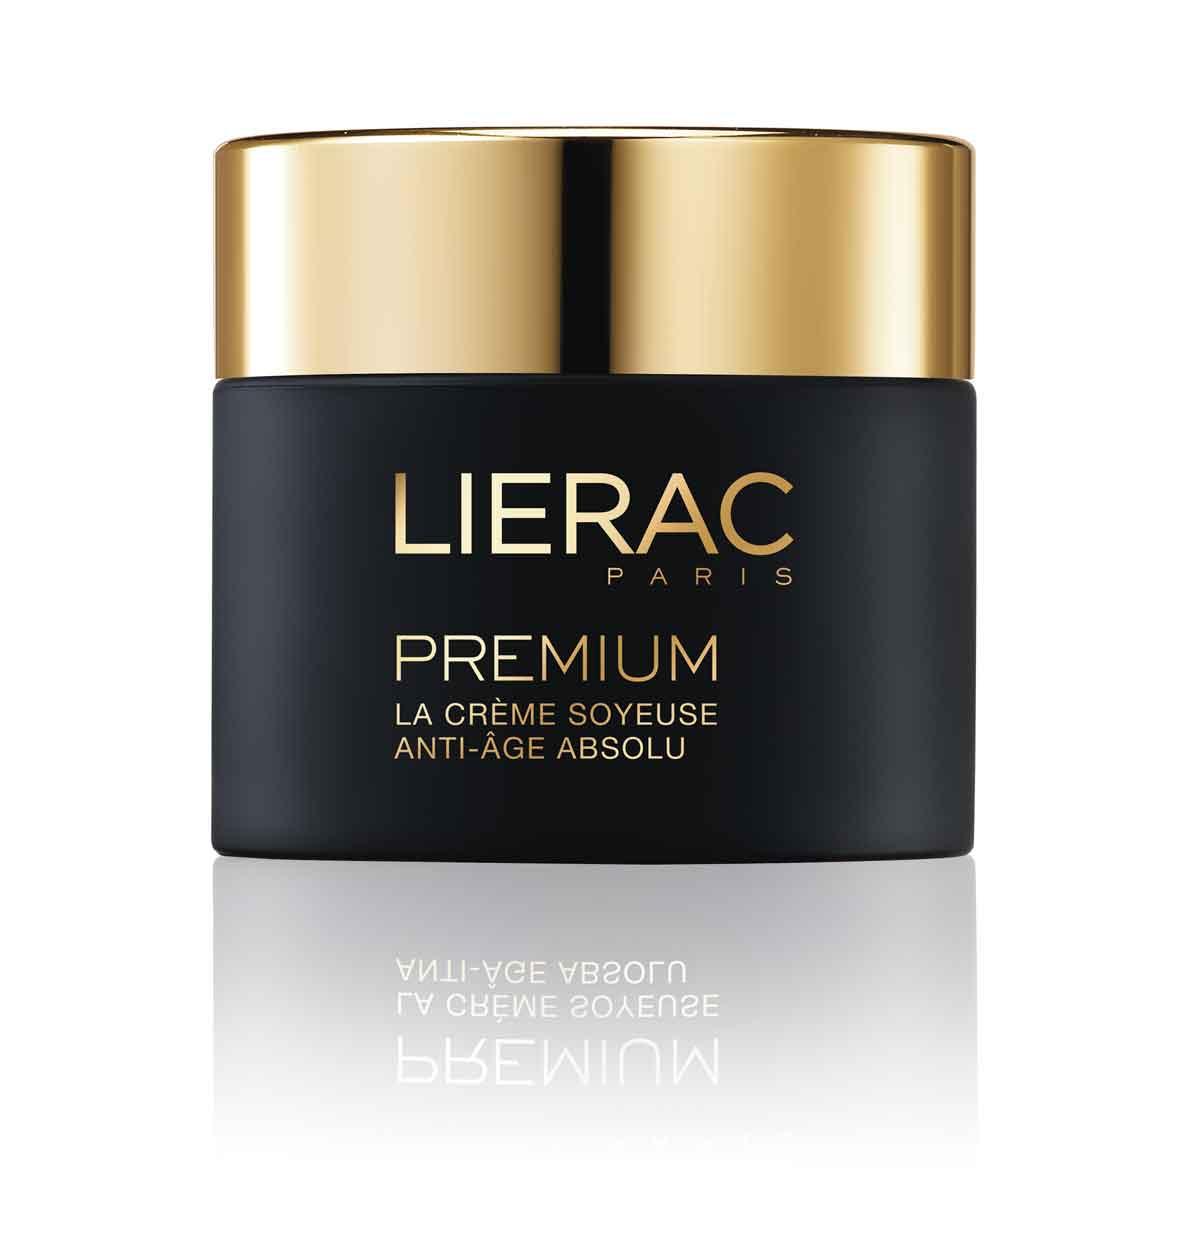 Premium Crema sedosa de Lierac